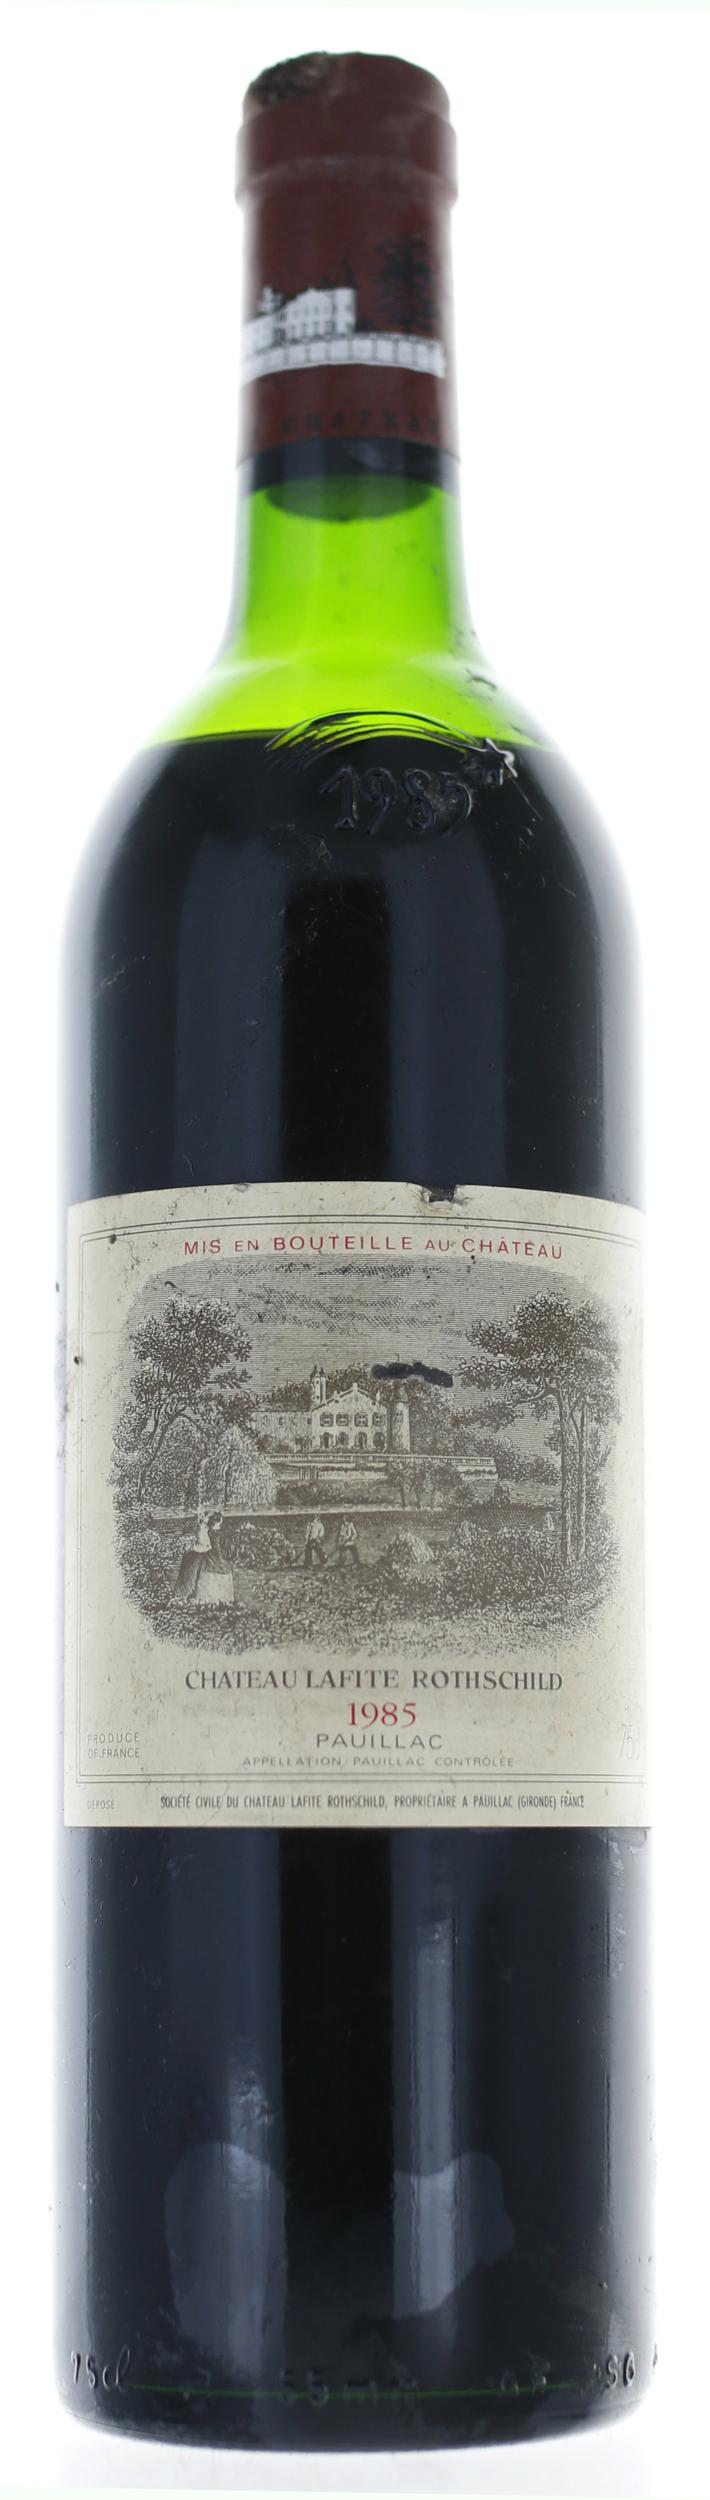 Pauillac - Château Lafite Rothschild - 1985